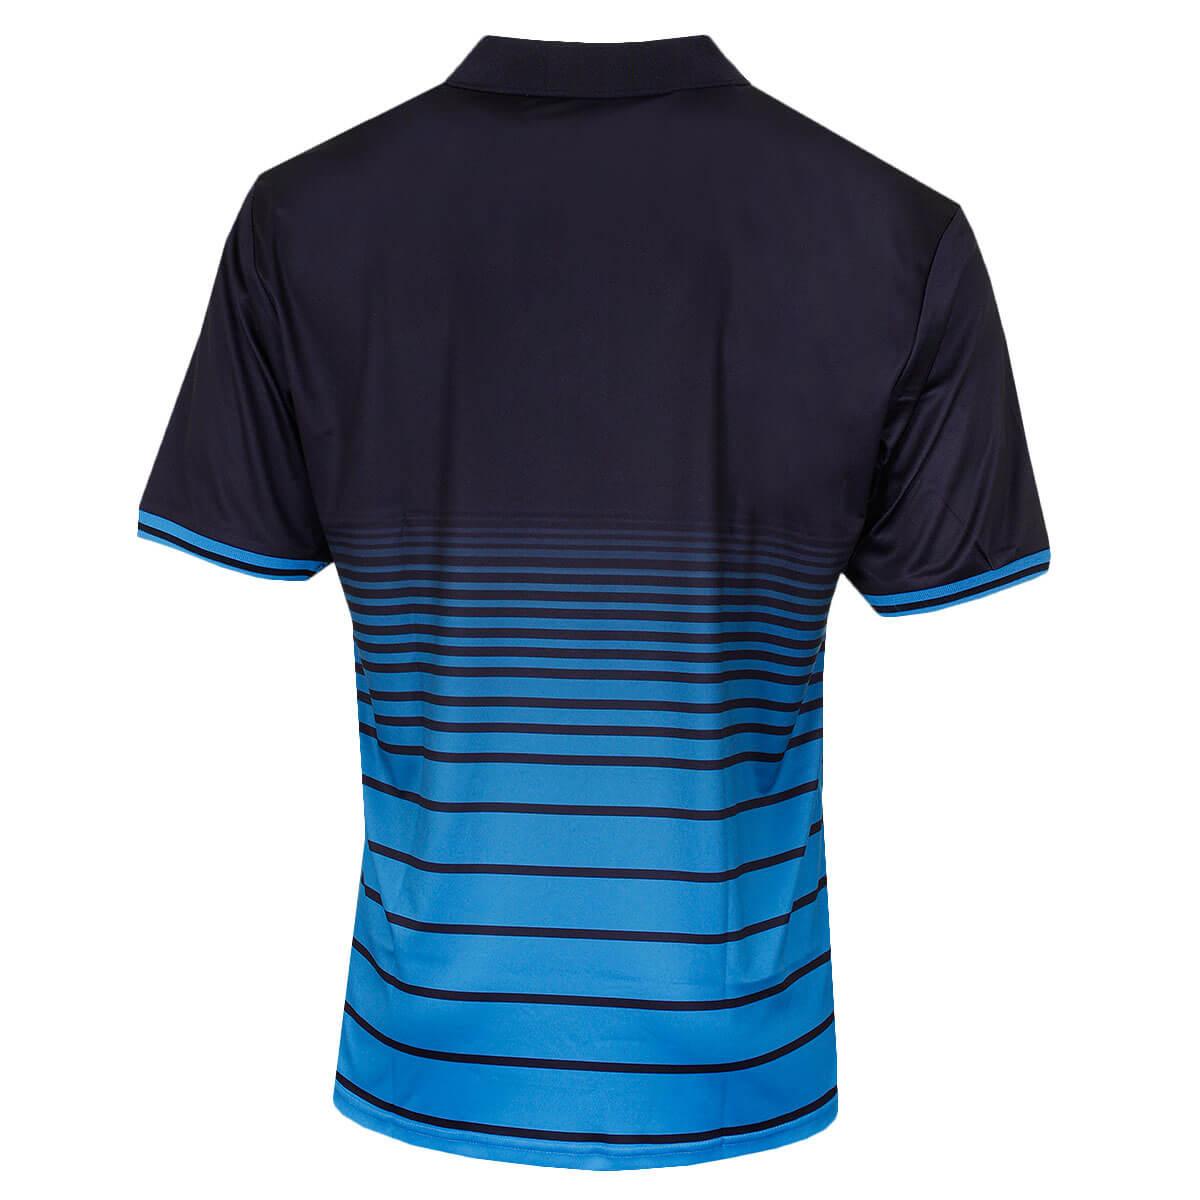 Island-Green-Mens-2019-Golf-1890-Sublimated-Stripe-Logo-Polo-Shirt-43-OFF-RRP thumbnail 3